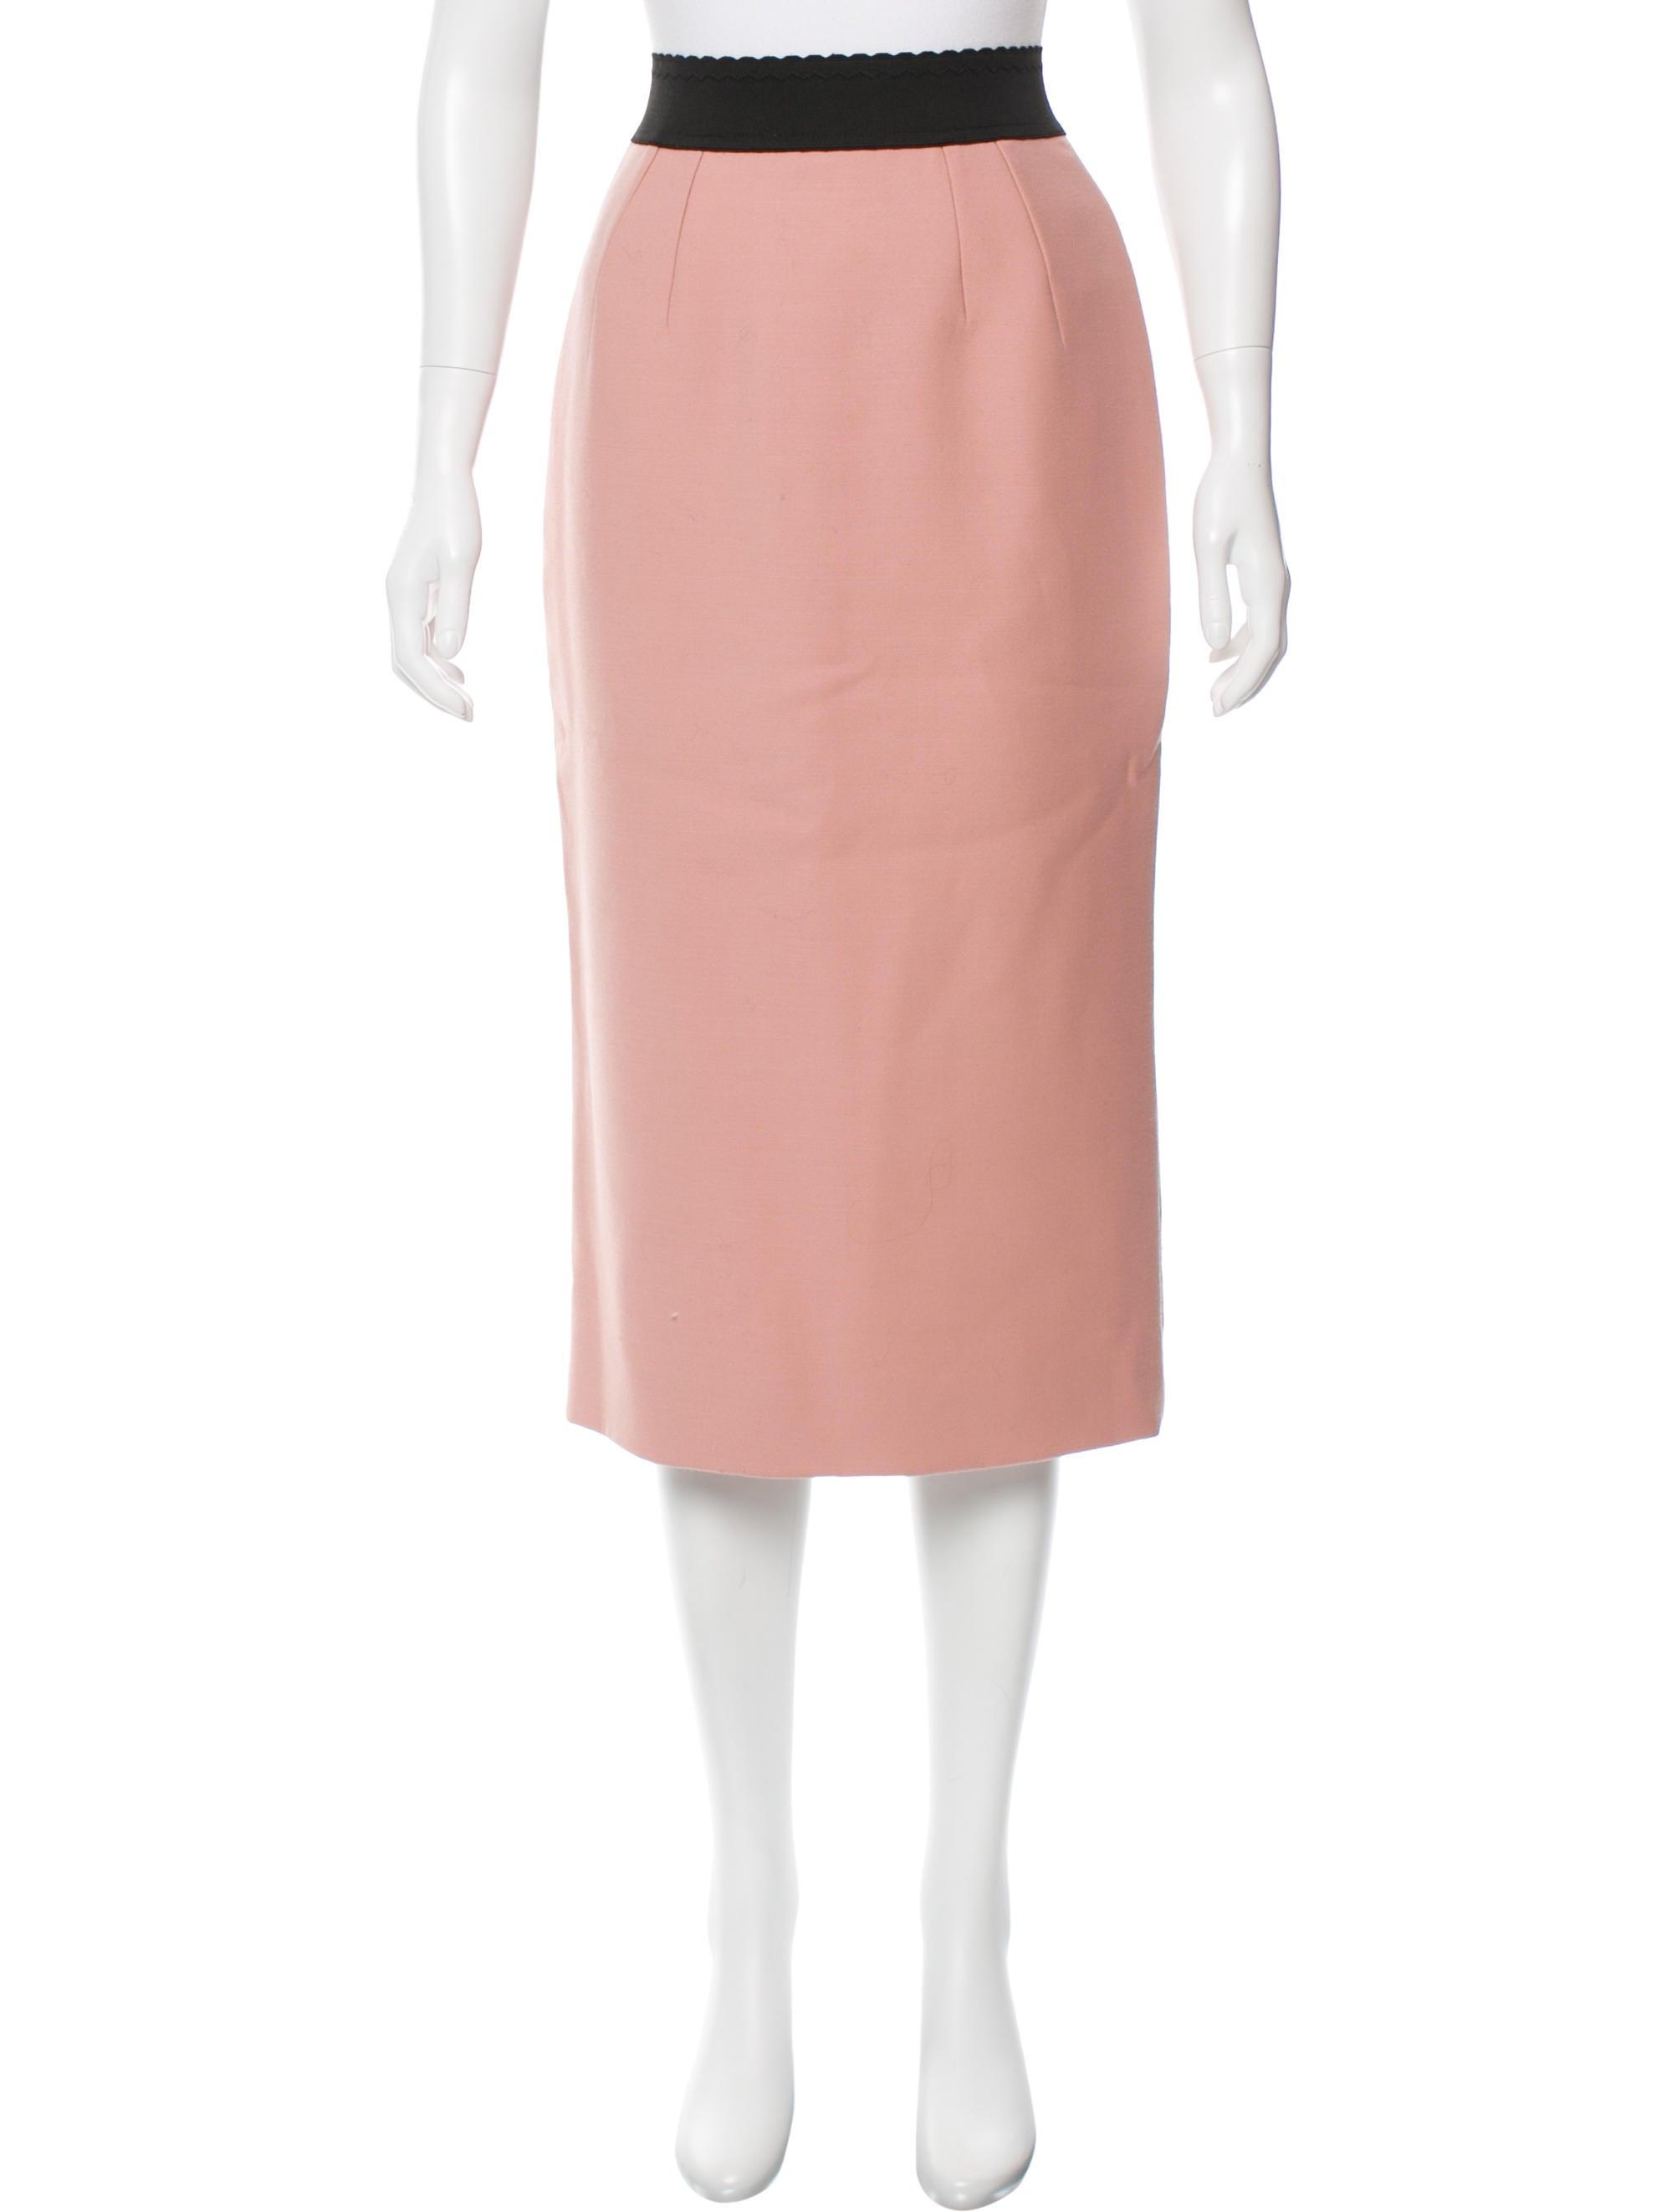 dolce gabbana classic midi skirt clothing dag74002